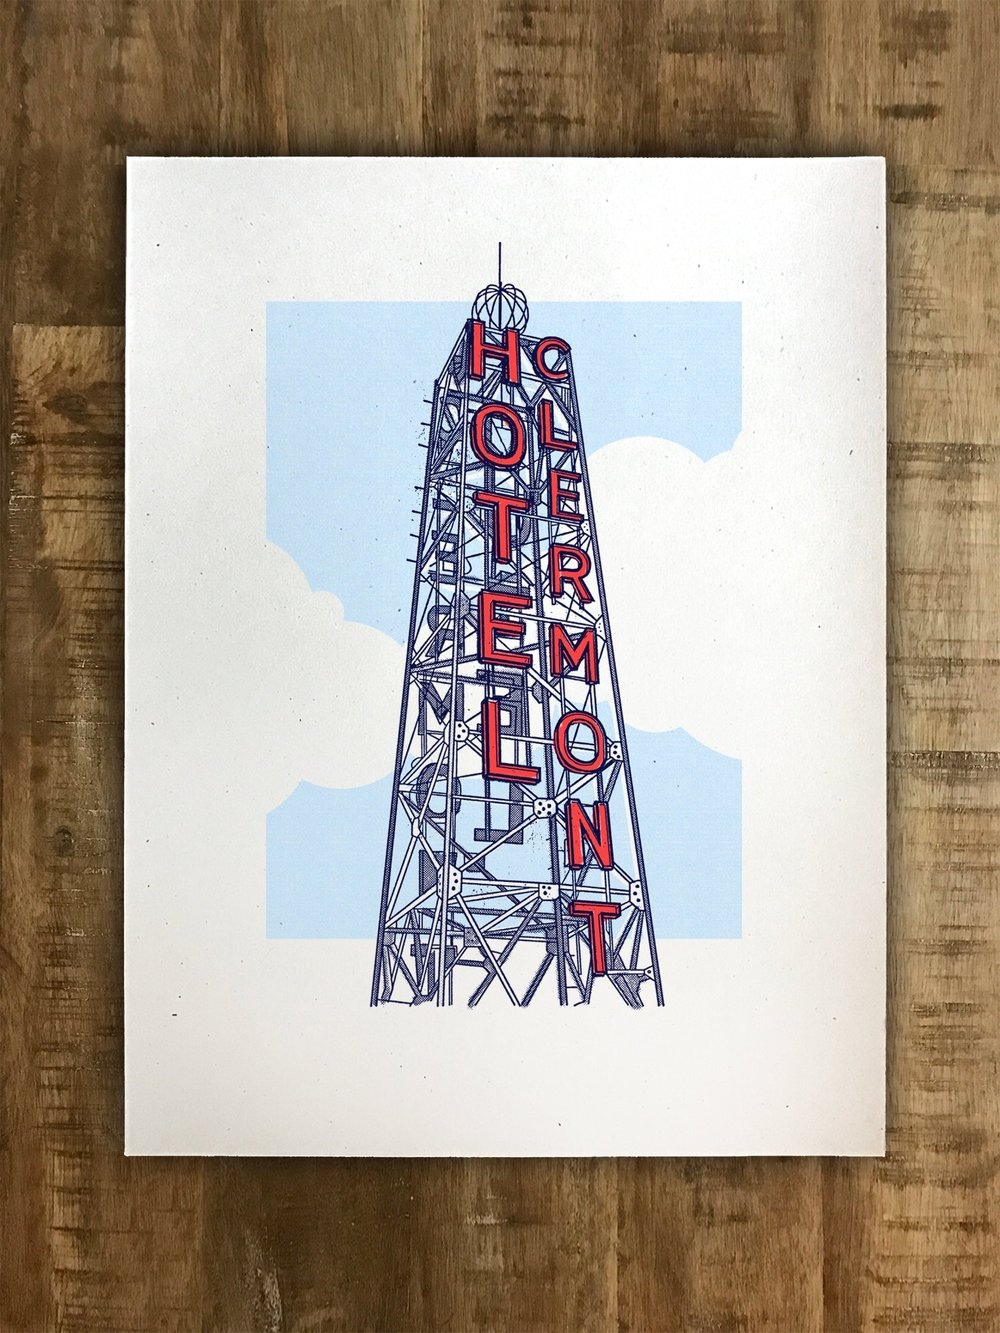 Hotel Clermont Tower - by Seth WcWhorter - Atlanta, Georgia - Illustration - Multiple Sizes - (Original Print) - Original illustration of the iconic Hotel Clermont Tower in Atlanta, Georgia.Offered in 3 sizes. $15+